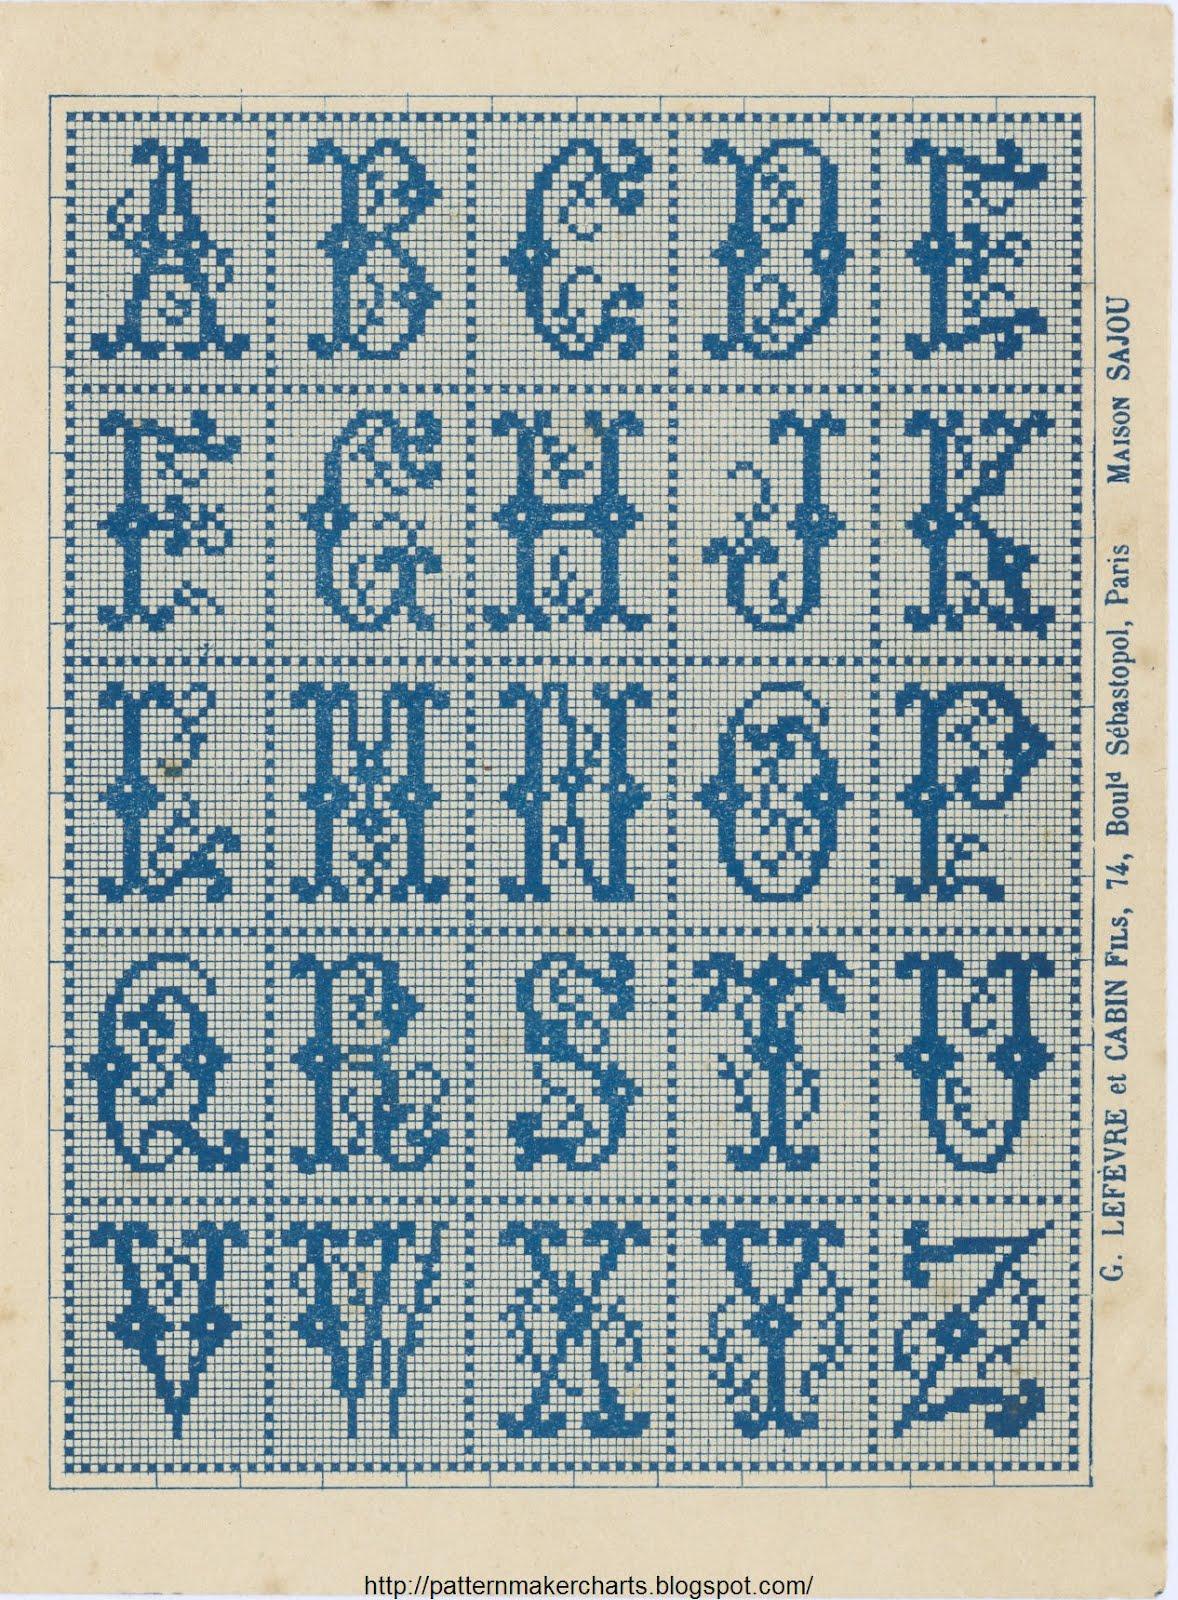 Вышивка латинских букв